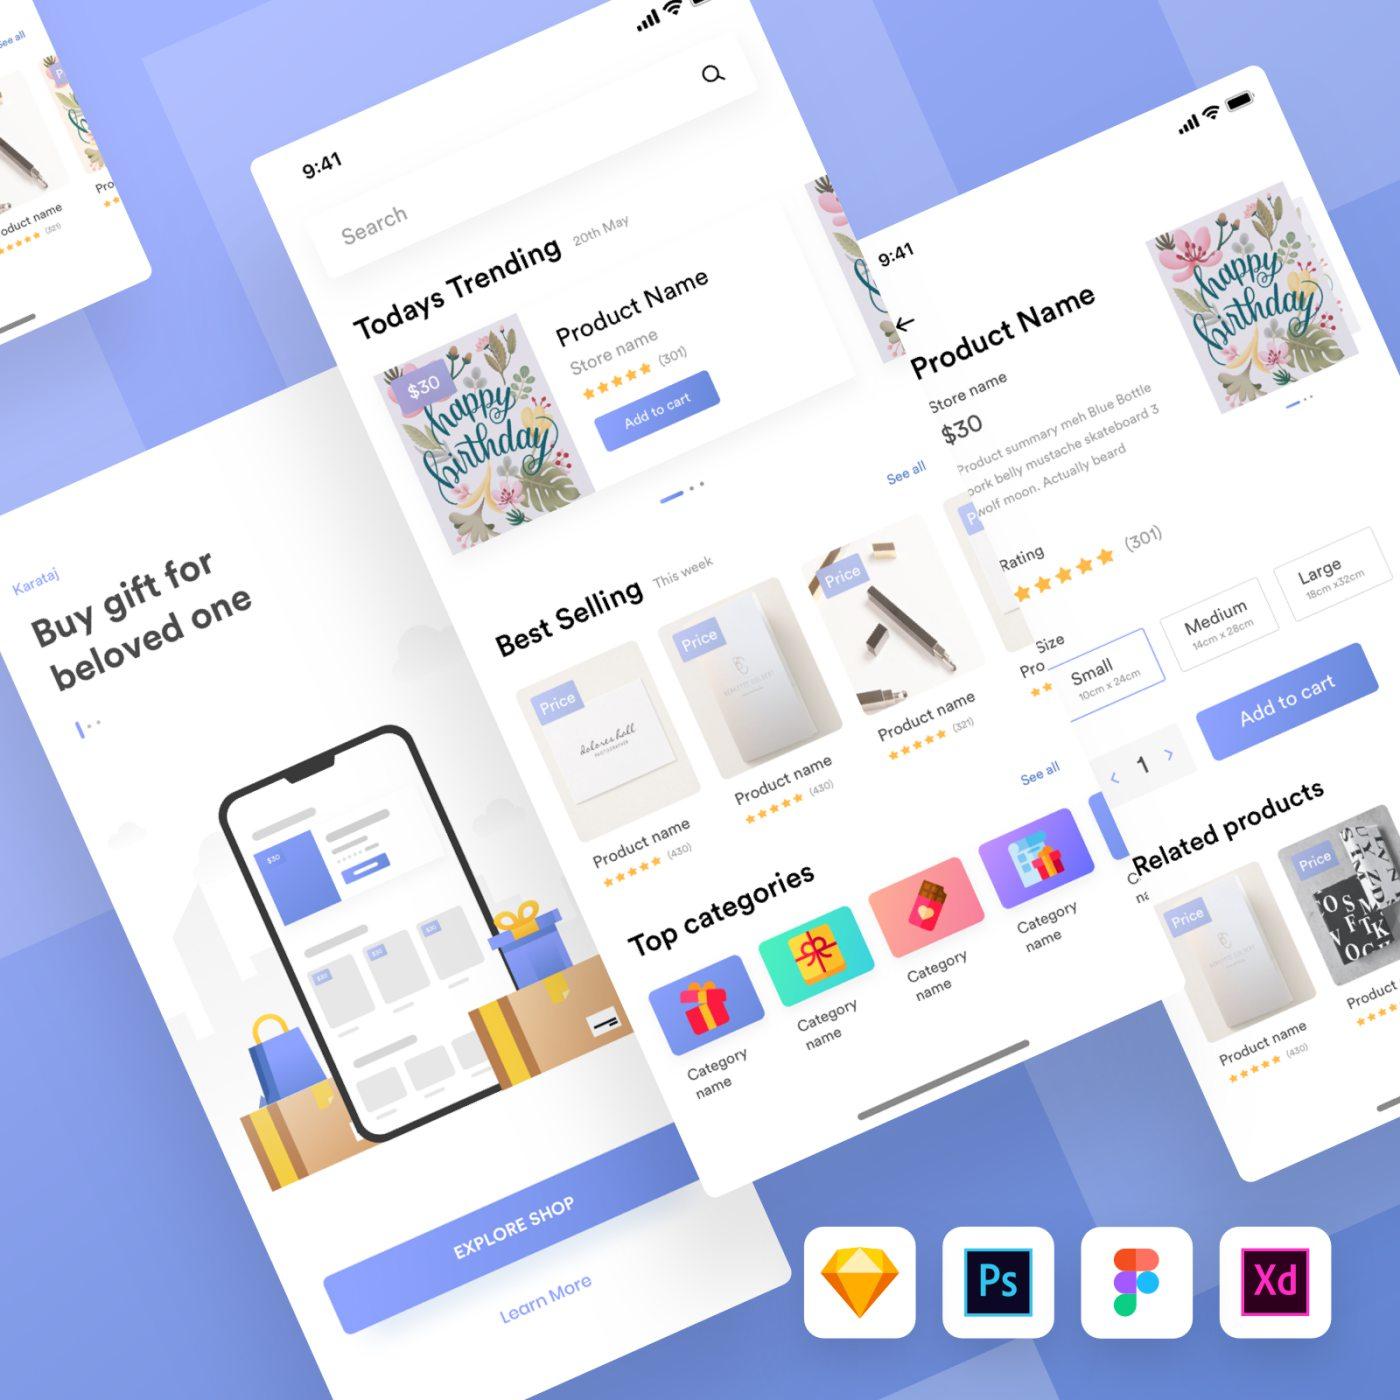 Kamartaj gift shop UI kit (Psd + Sketch + Fig + Xd)